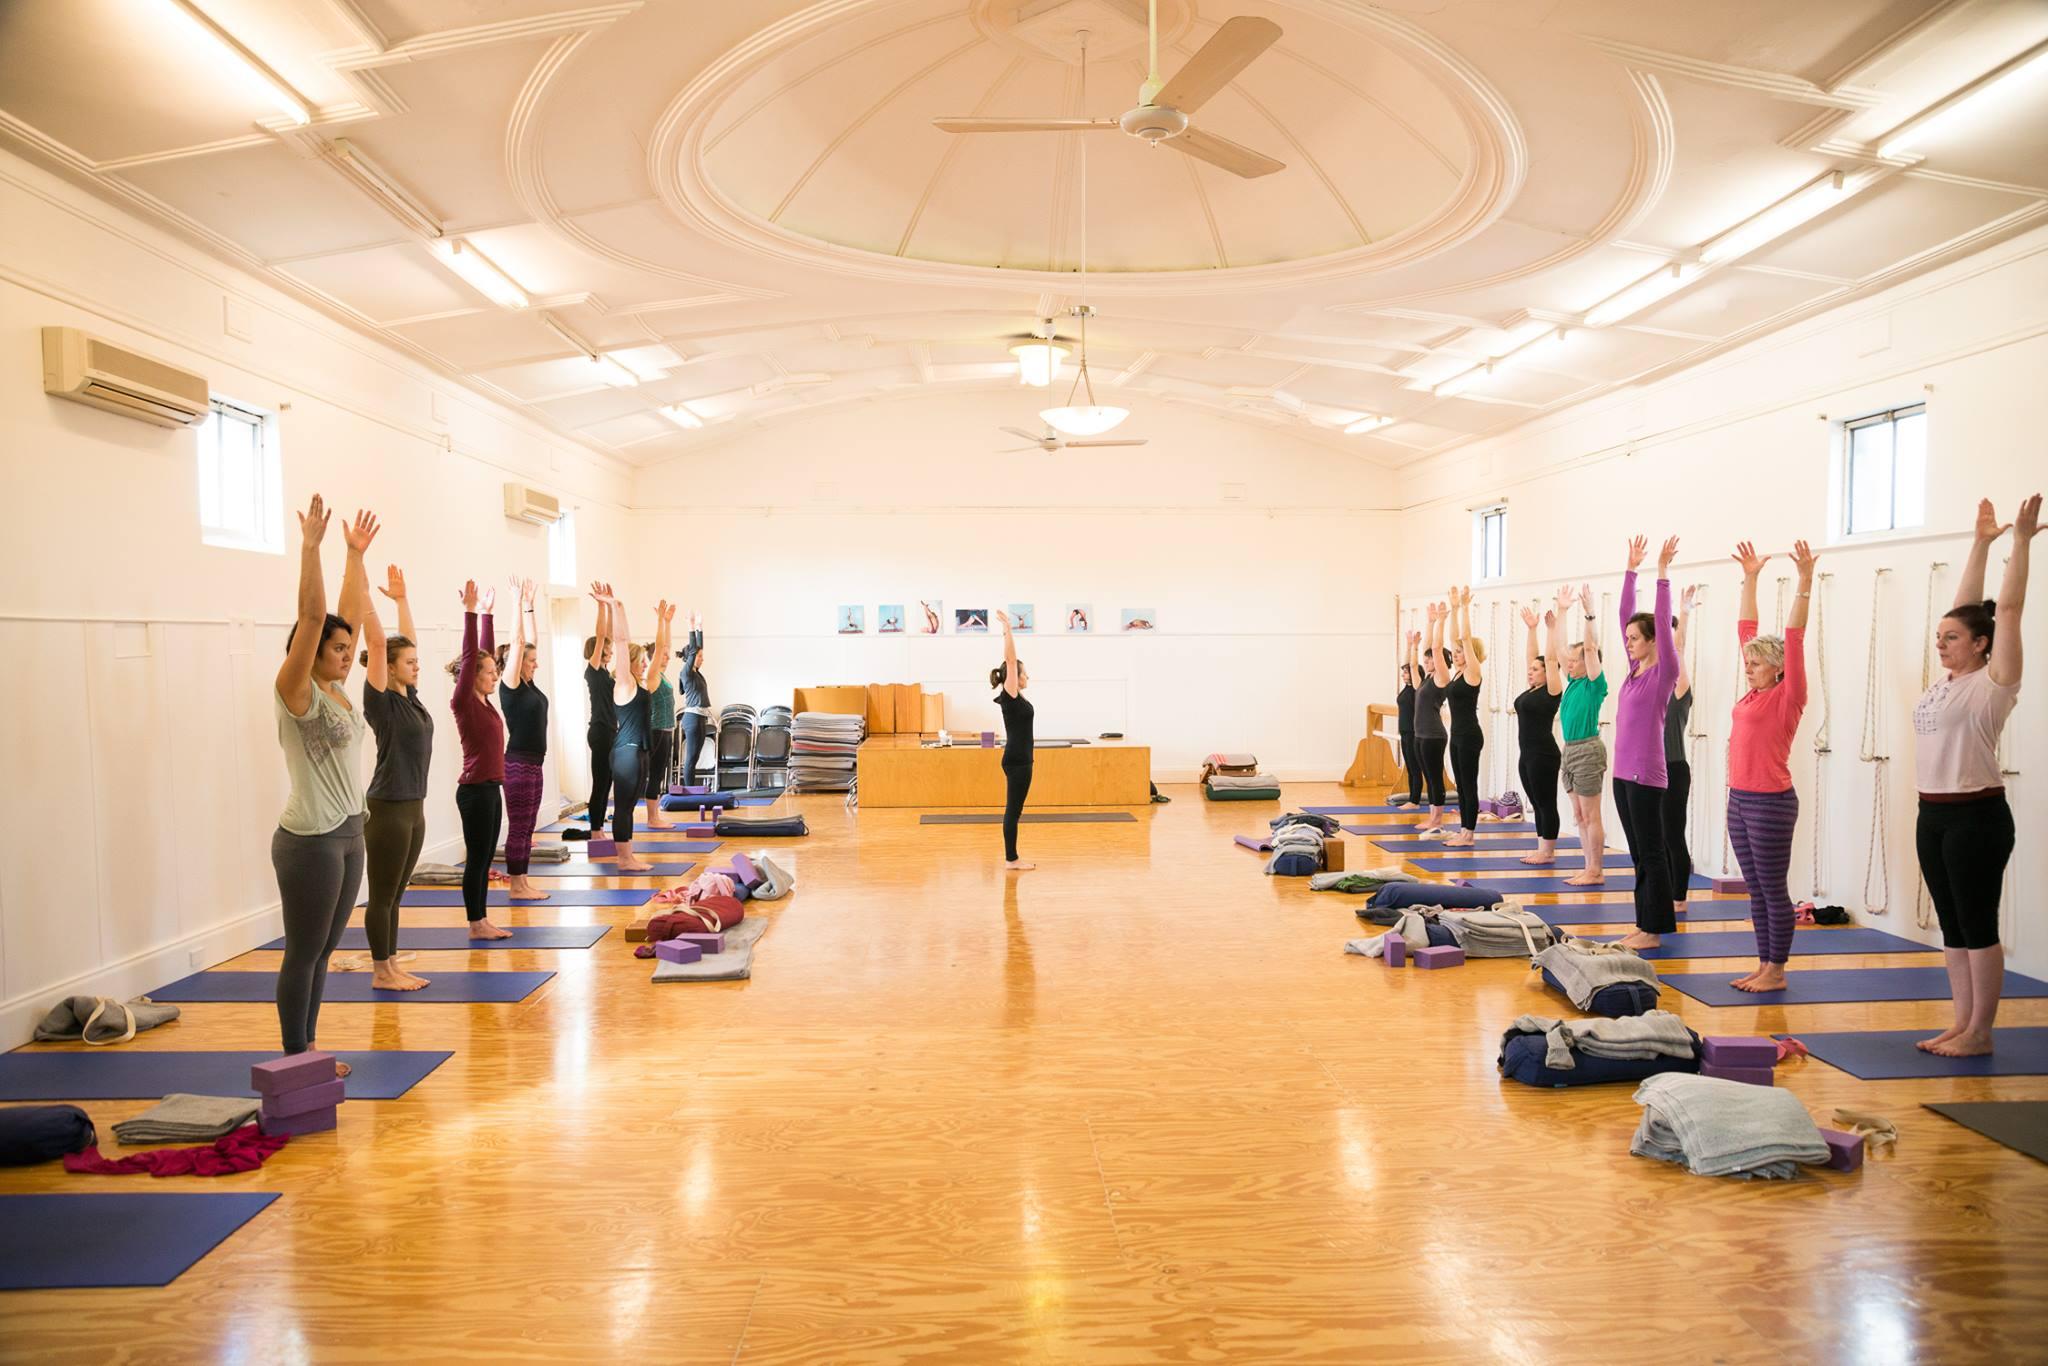 clifton-hill-yoga-studio-victoria8-australia-8